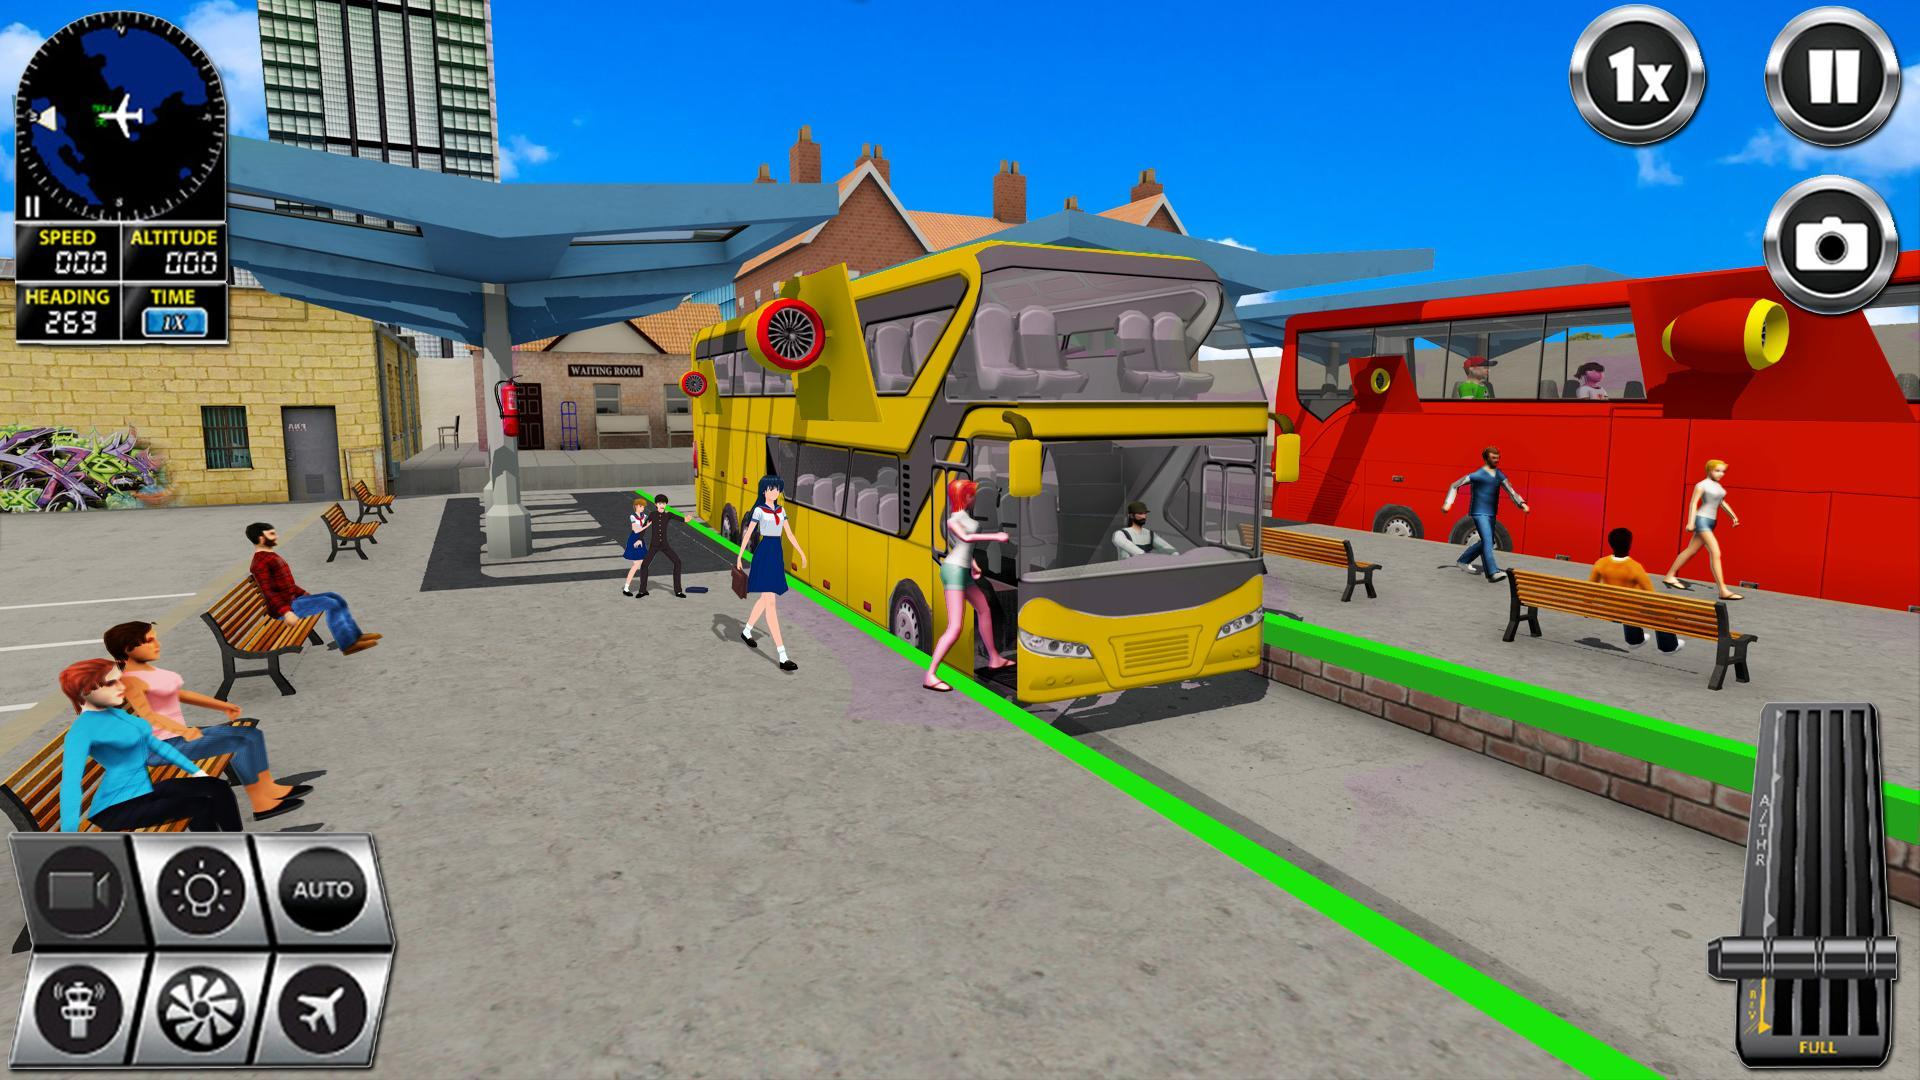 Flying Bus Driving simulator 2019: Free Bus Games 2.8 Screenshot 13